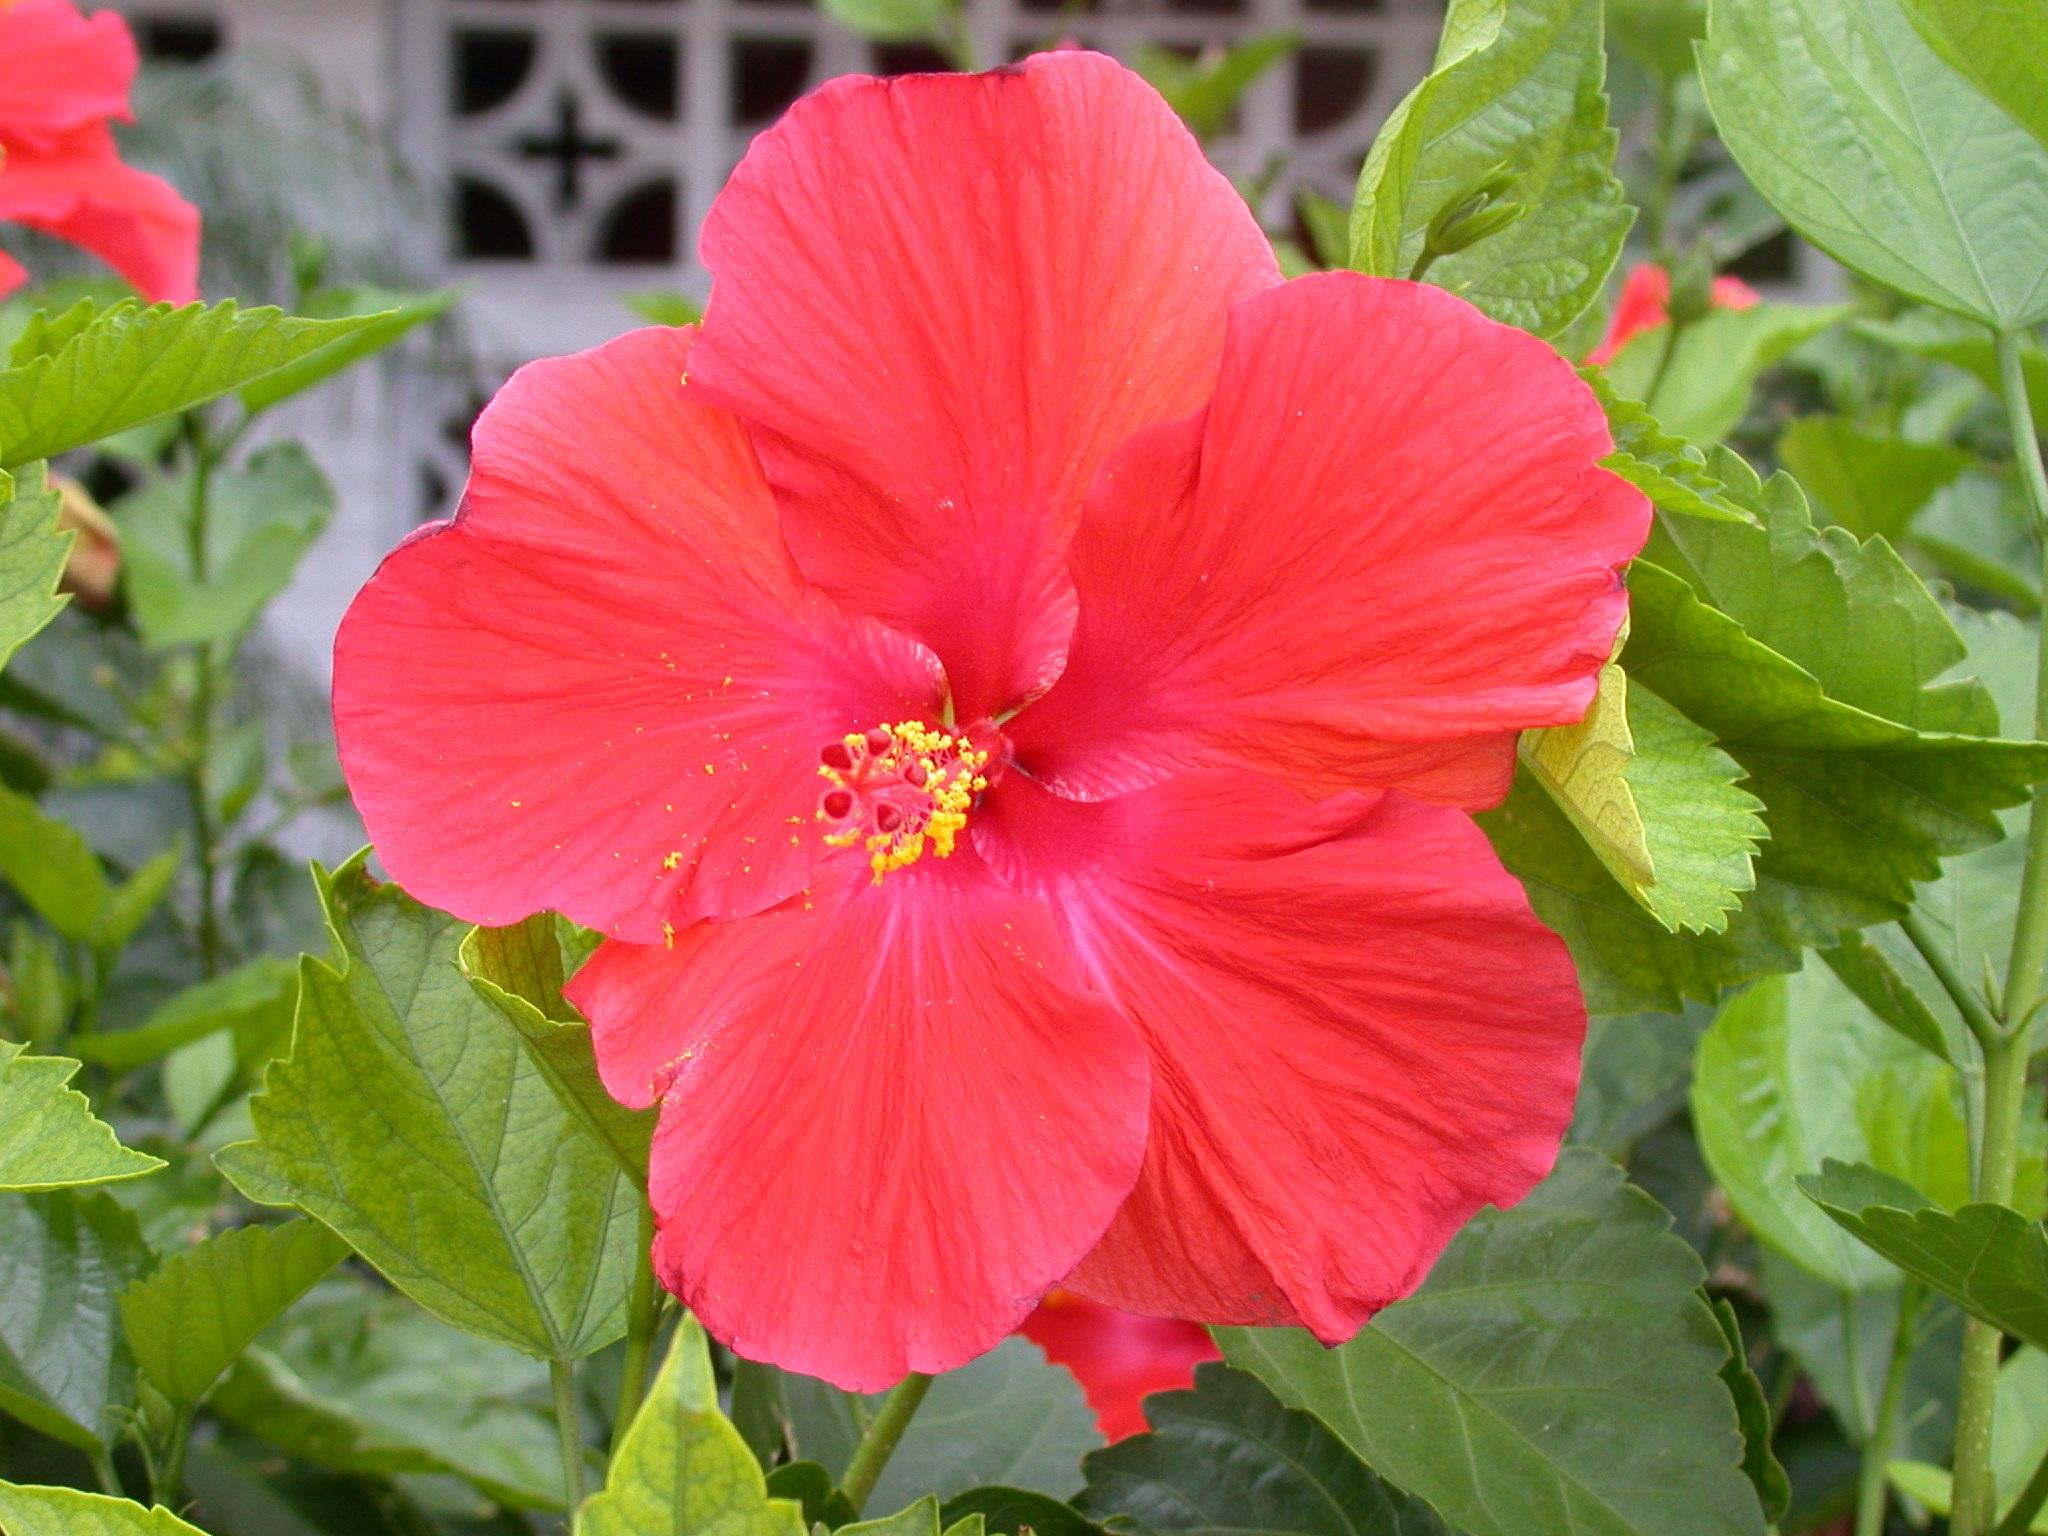 Free Images : nature, blossom, flower, petal, bloom, floral, red ...